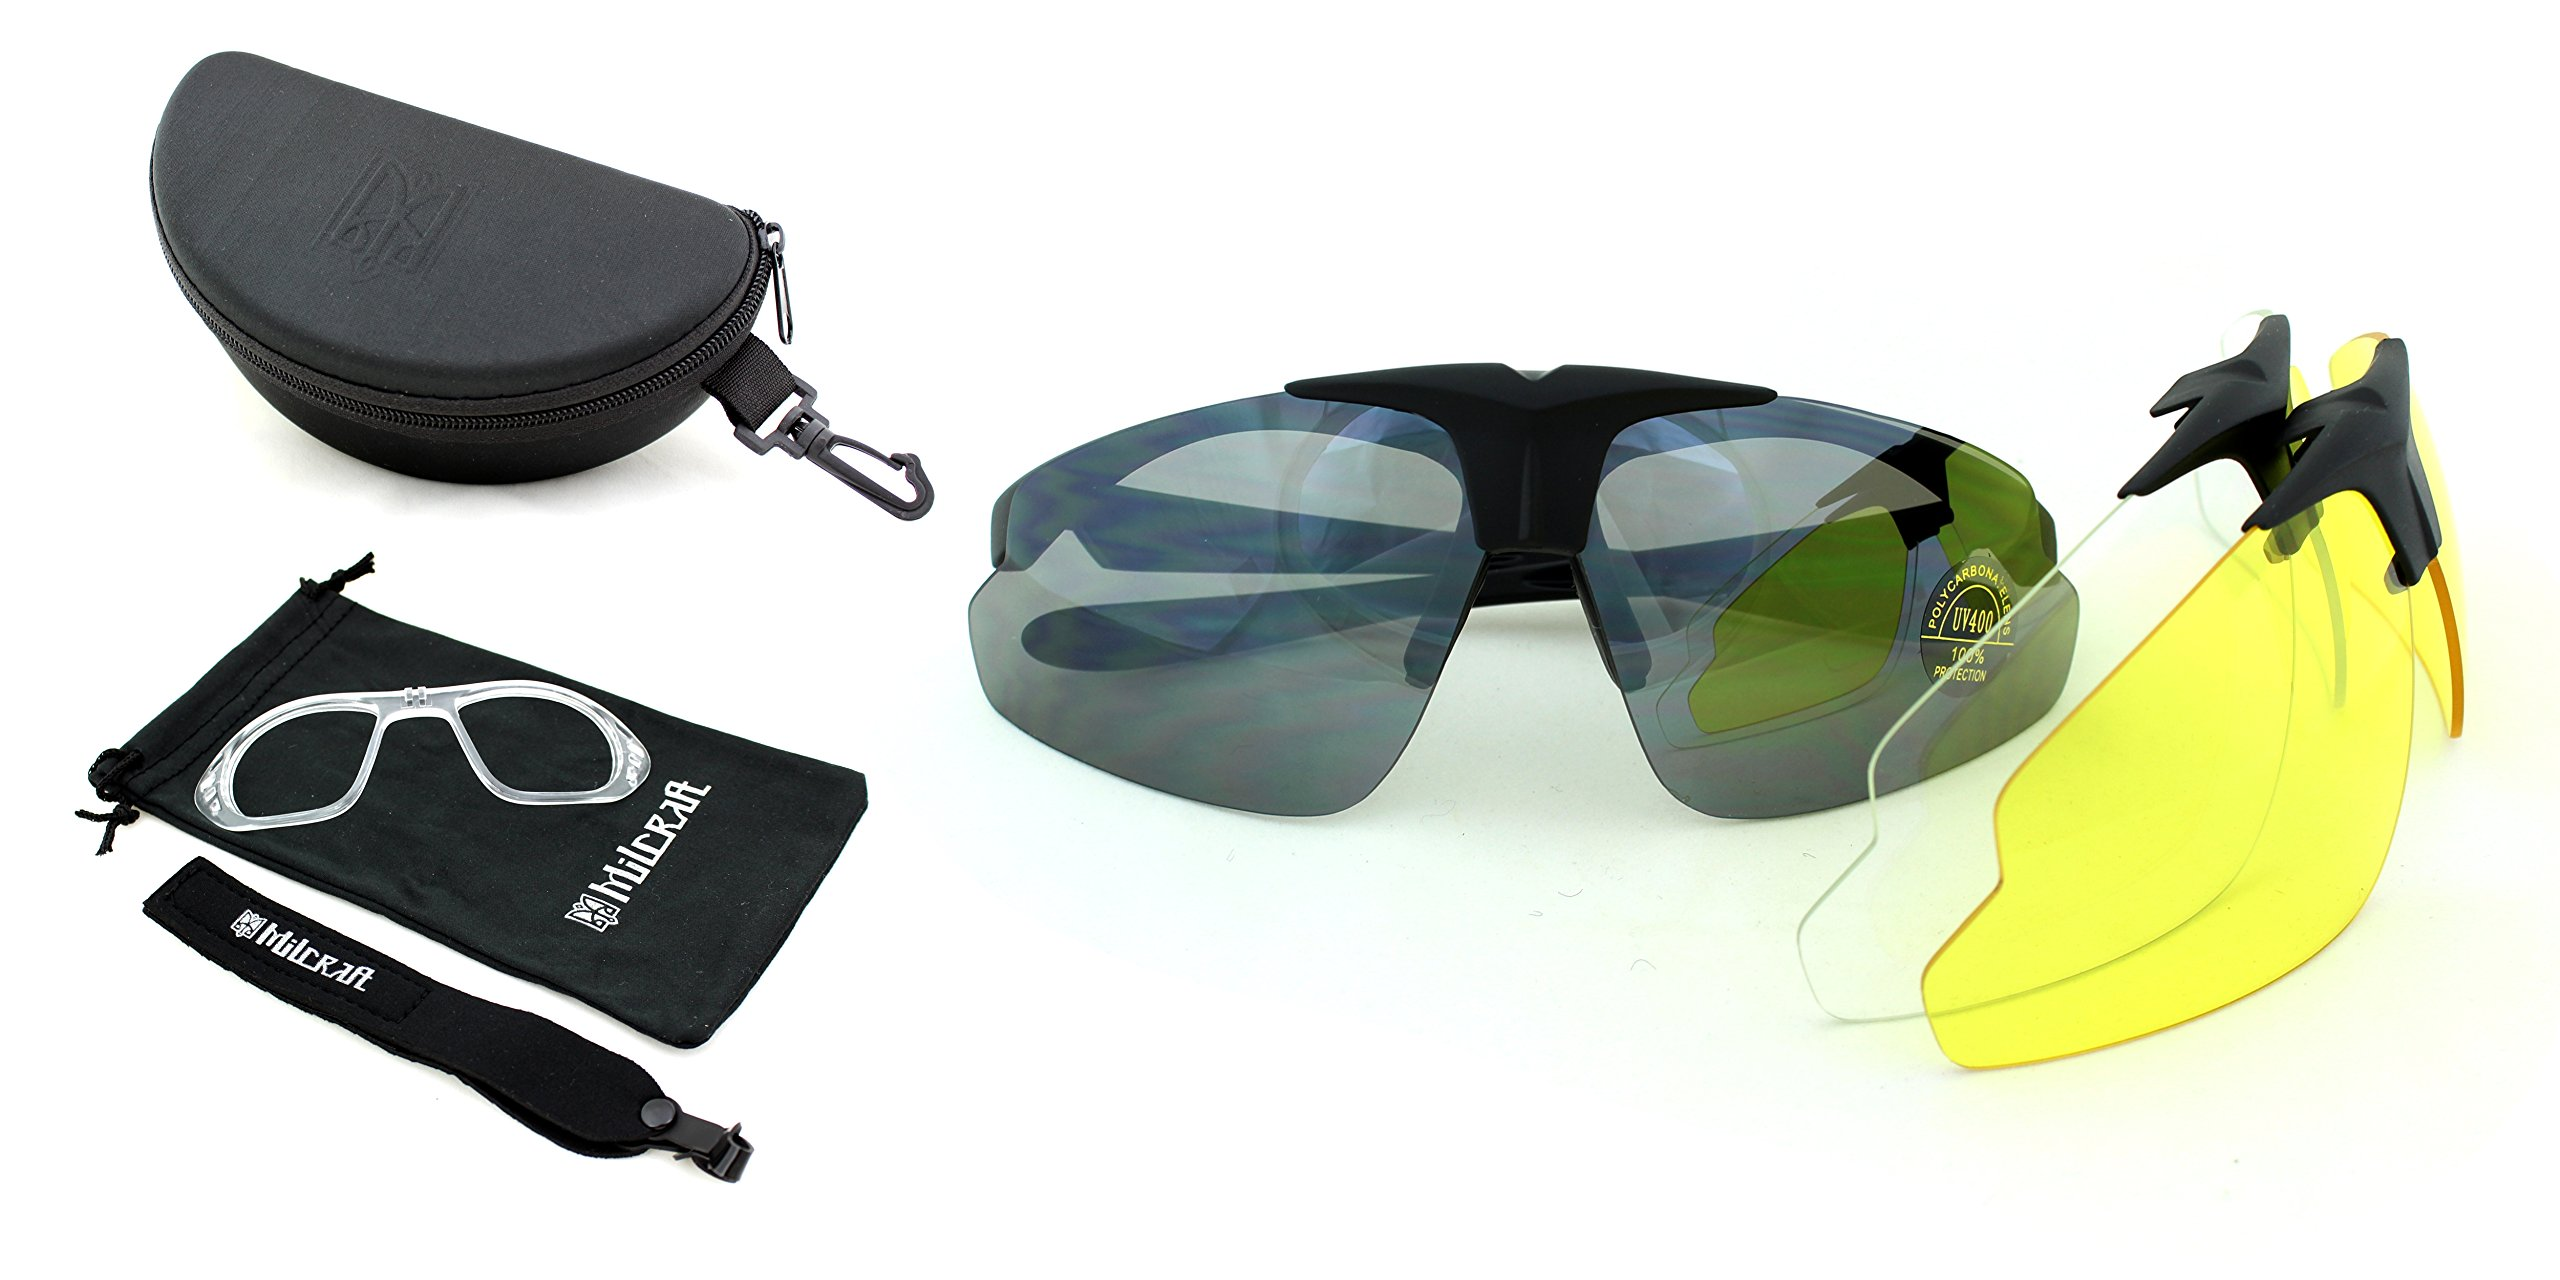 Milcraft Gafas Protectoras Balística Tácticas/ Gafas de seguridad/ Gafas de tiro, kit de